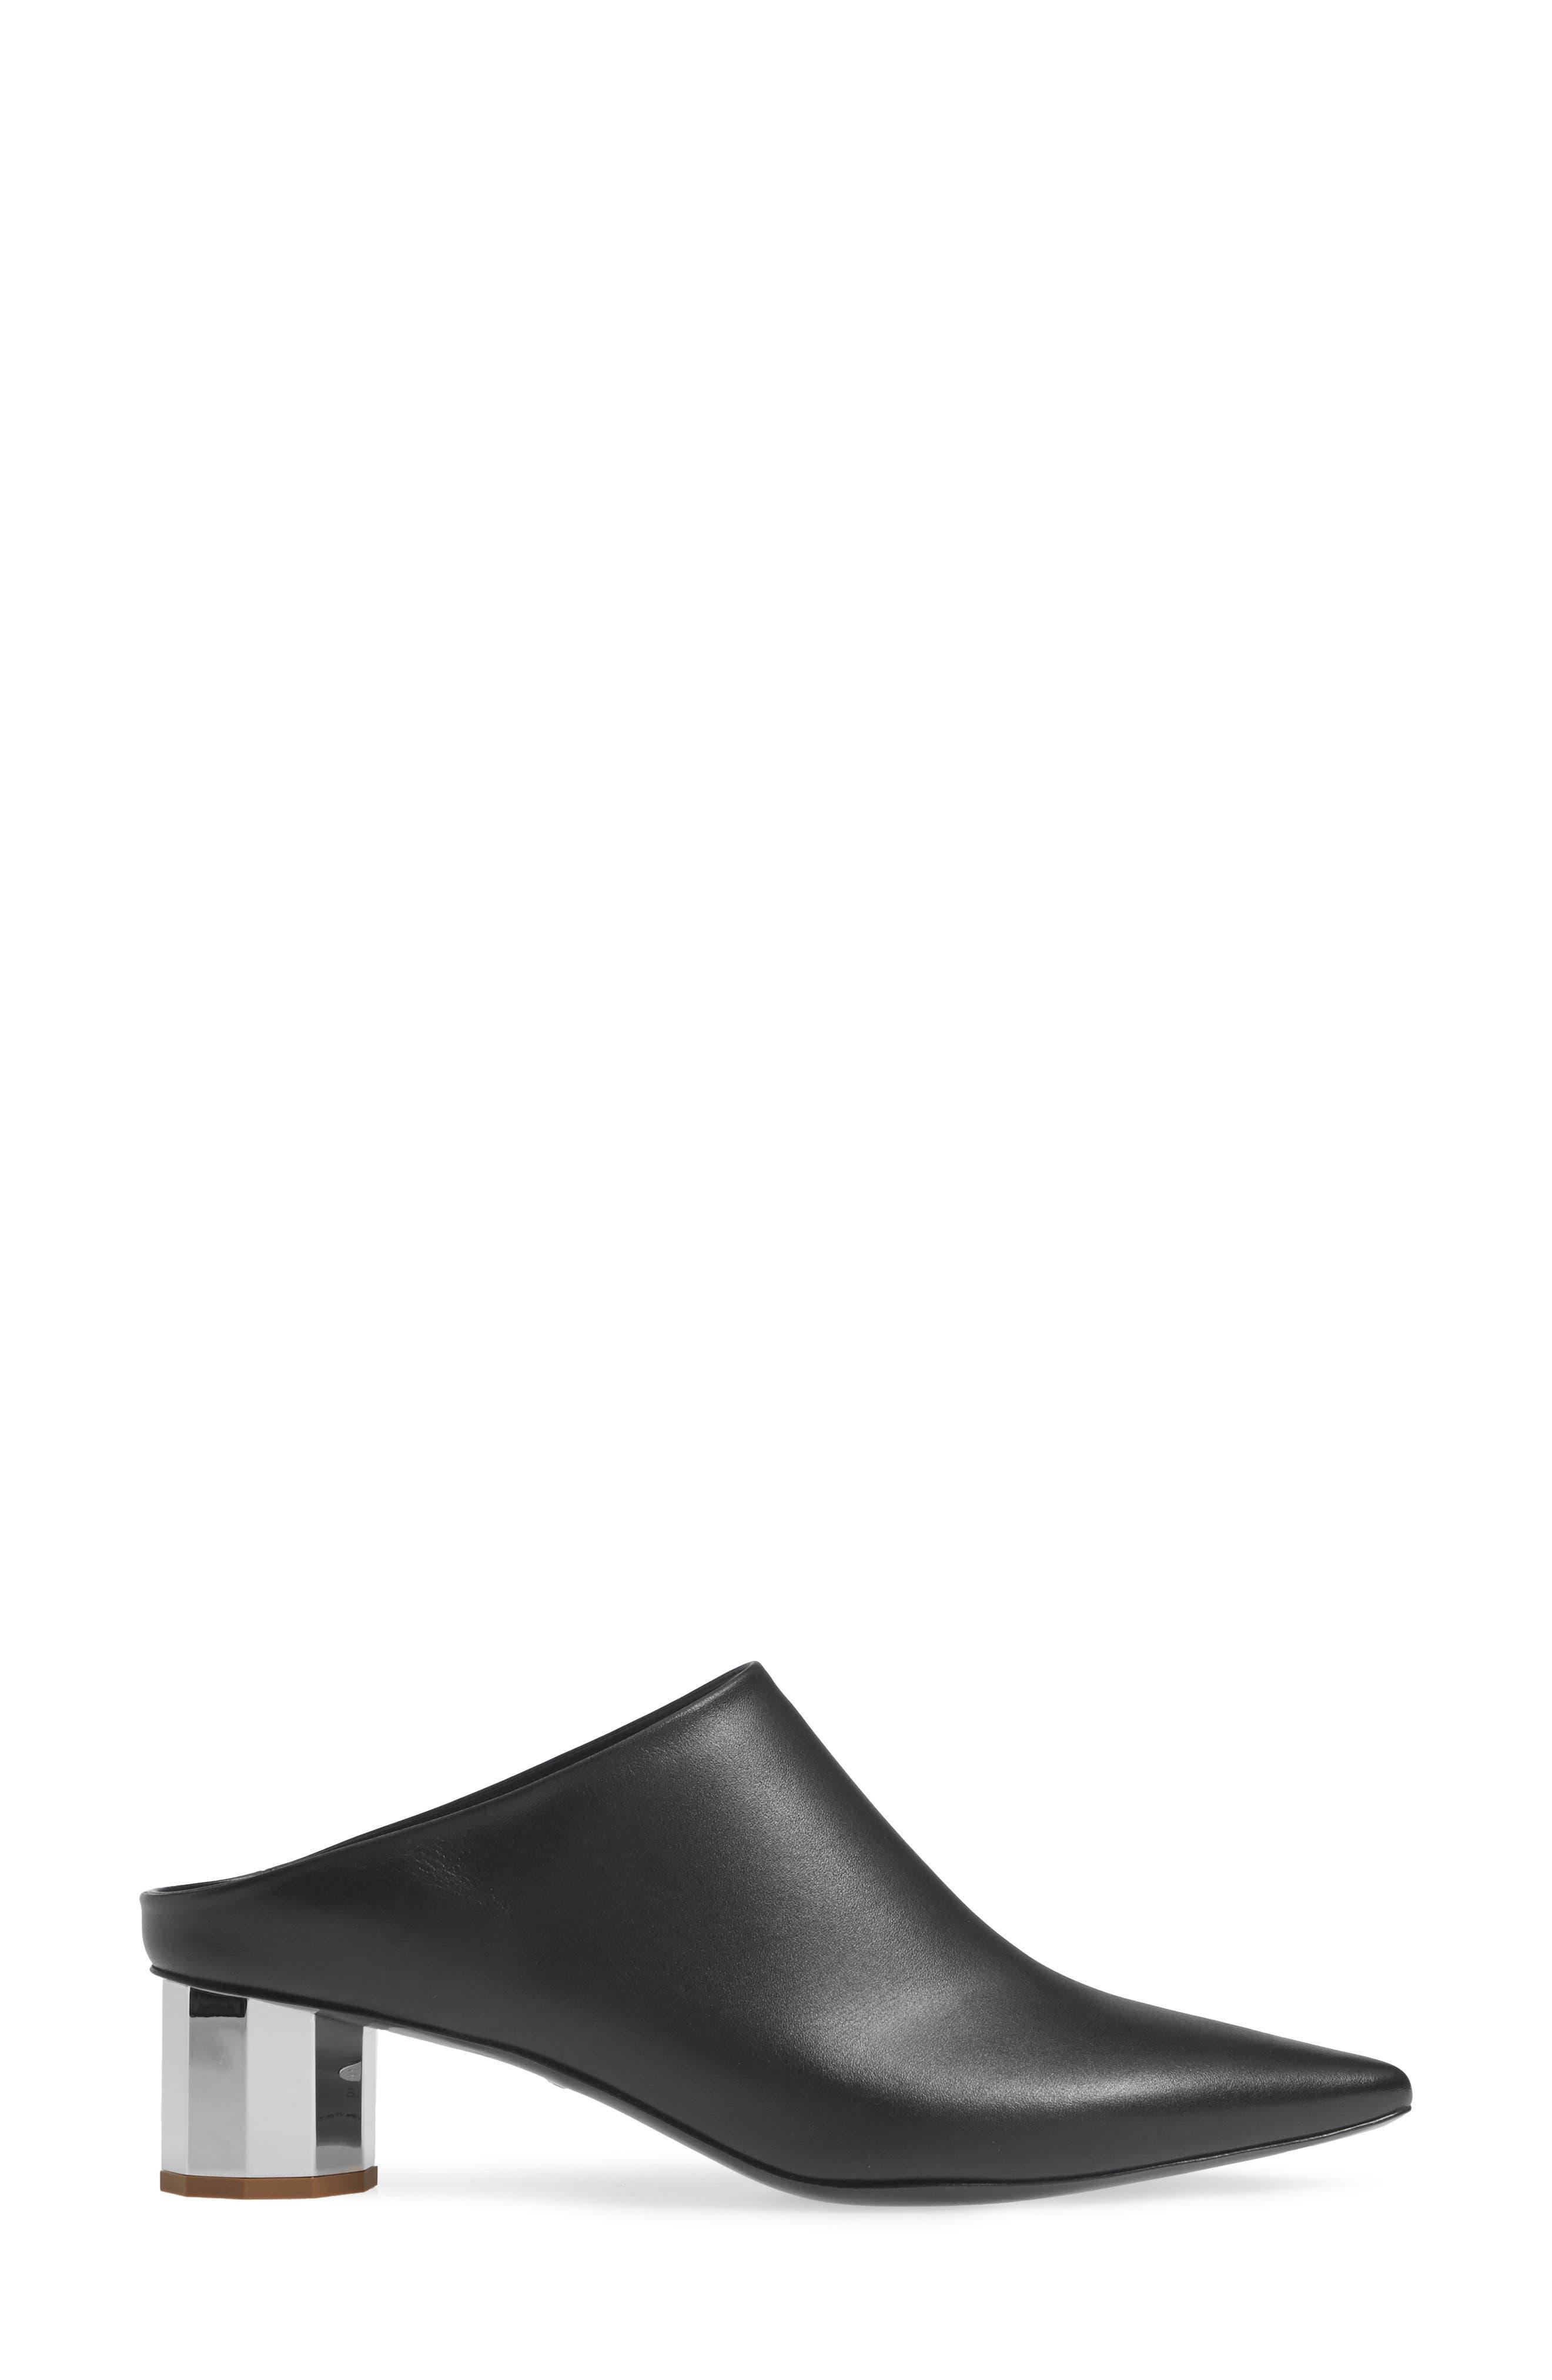 PROENZA SCHOULER, Pointy Toe Mule, Alternate thumbnail 3, color, BLACK